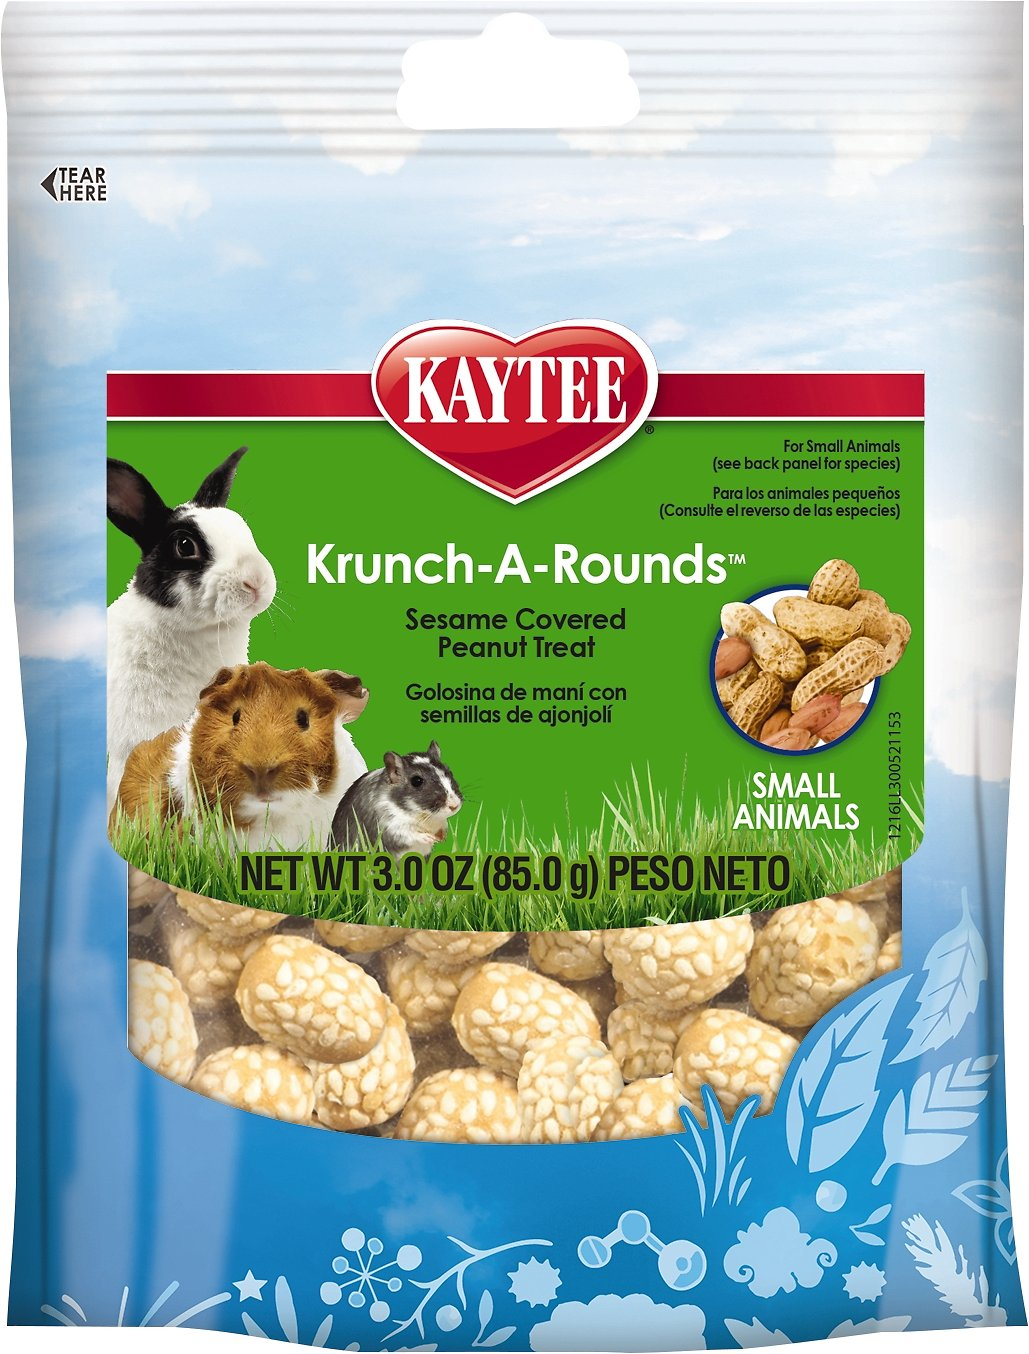 Kaytee Fiesta Krunch-A-Rounds Small Animal Treats, 3-oz bag